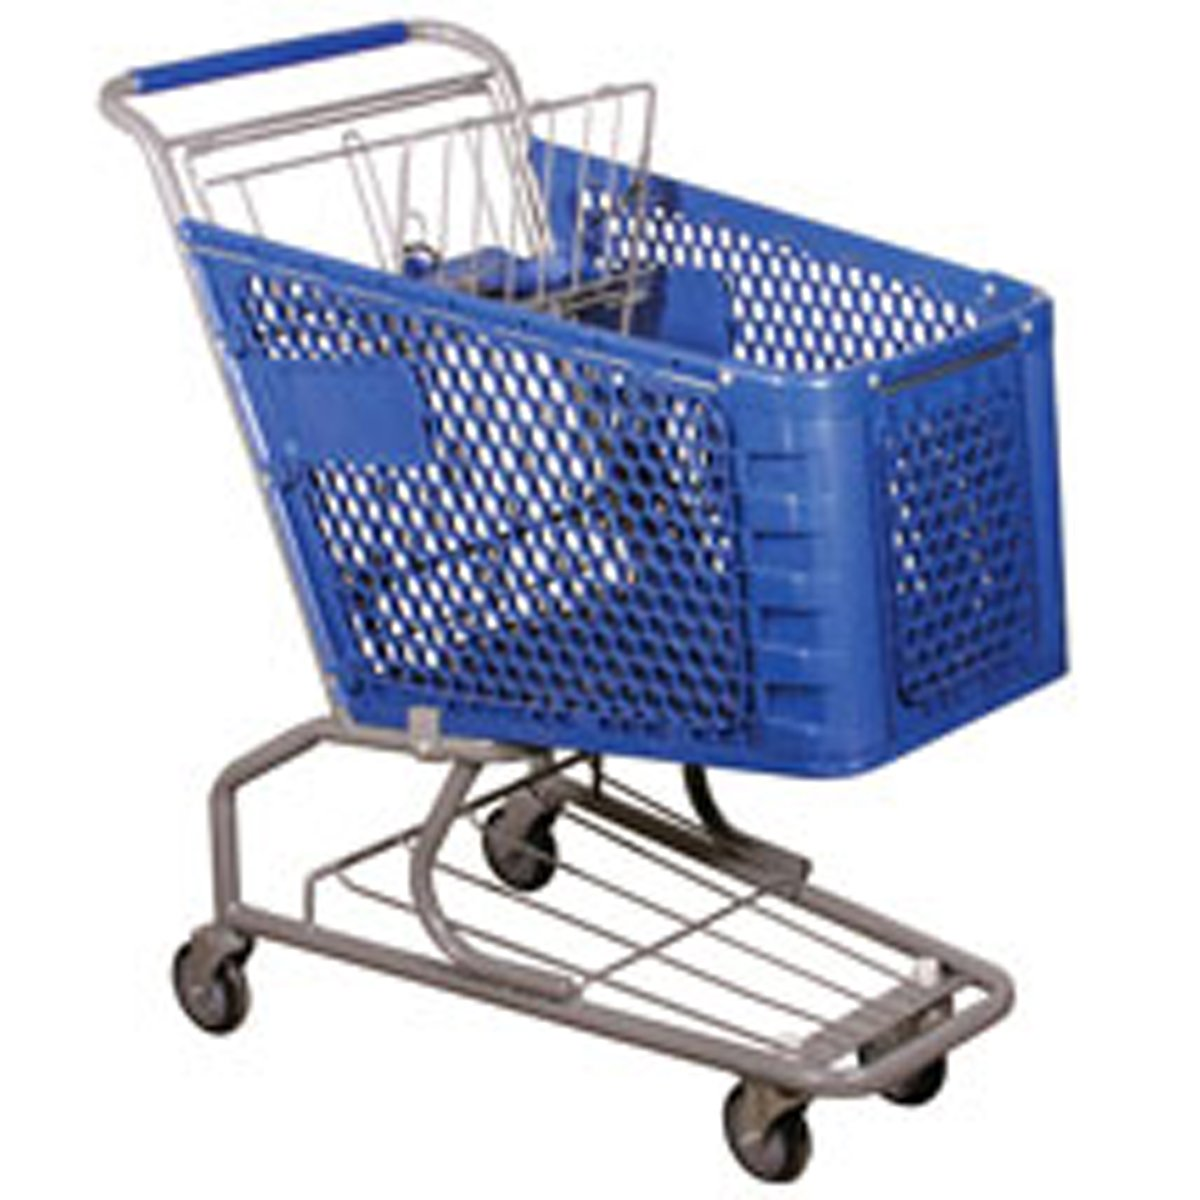 Shopping Cart Plastic Basket Super Market Convenience Store Blue Lot of 6 NEW